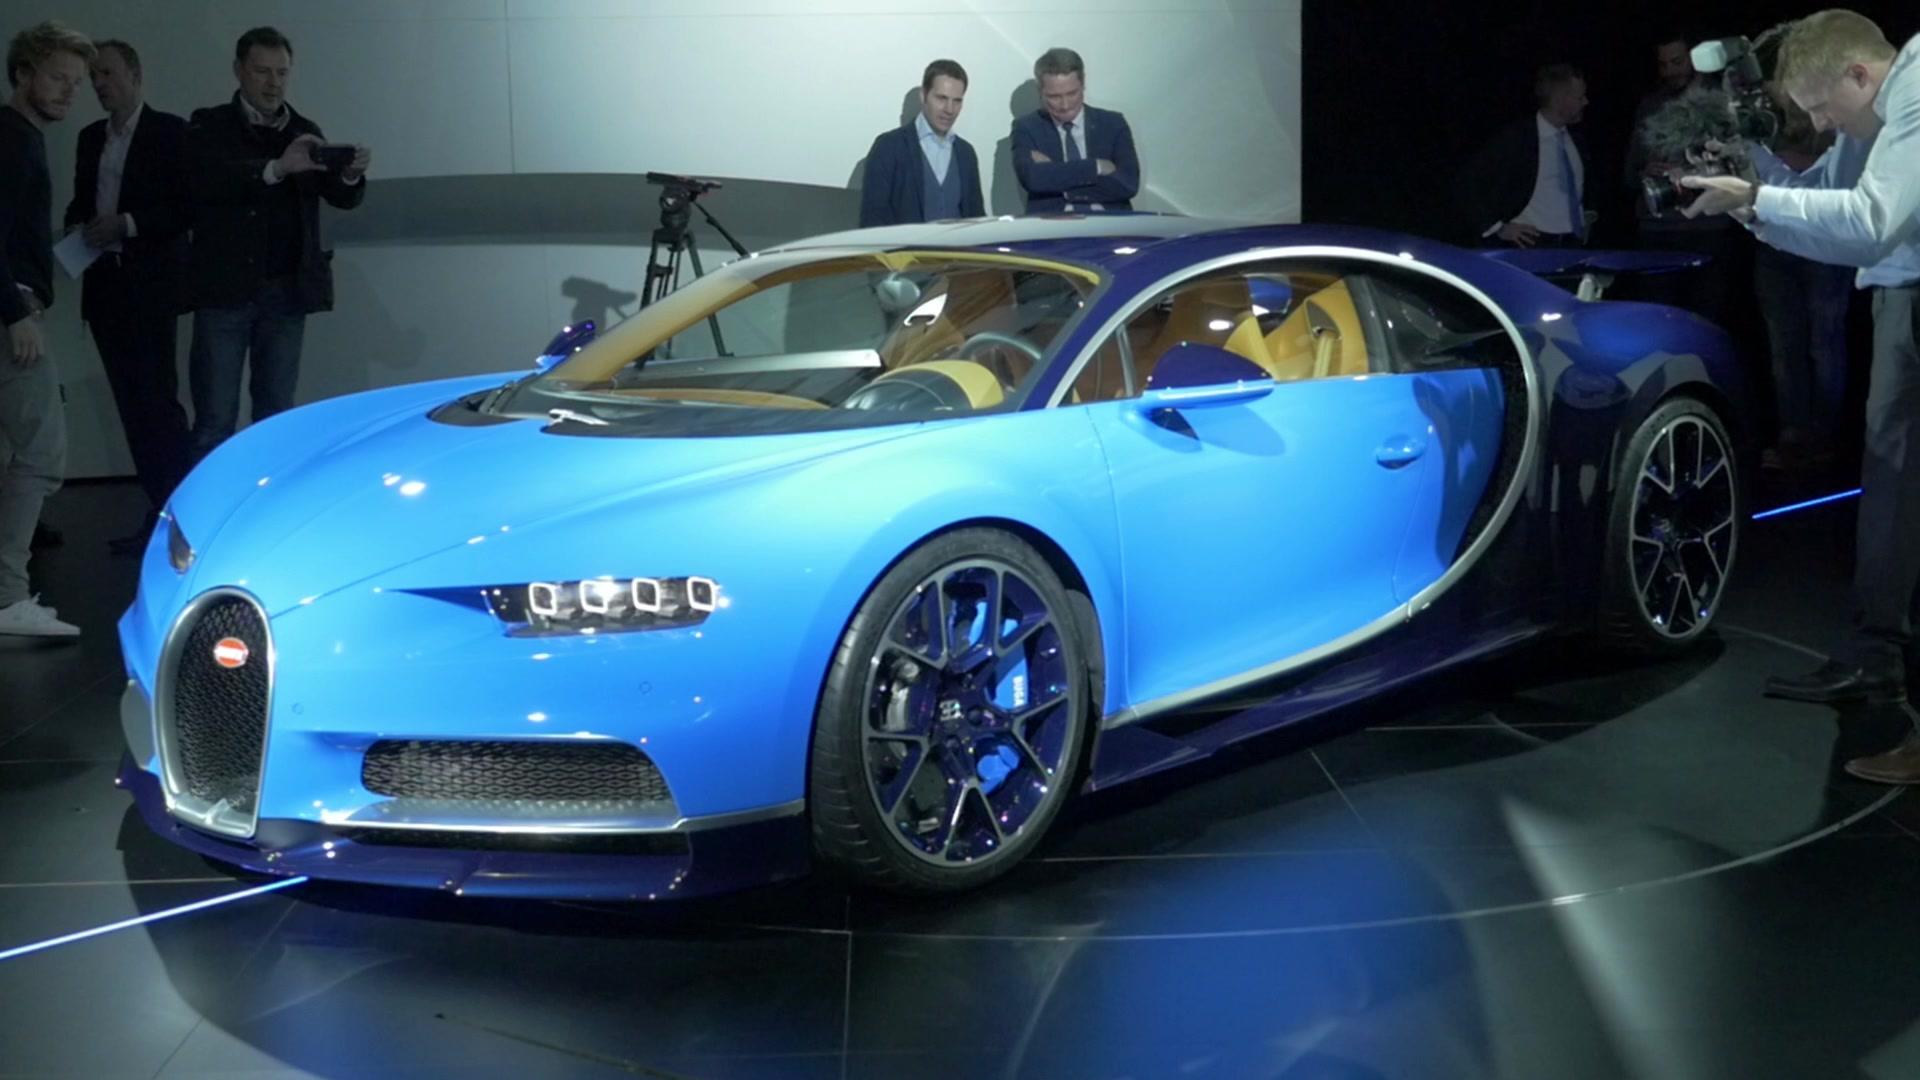 2013 Bugatti Veyron Engine Diagram Wiring Diagrams Data Base W16 Grand Sport Roadster Rh Homesecurity Press On Ferrari For